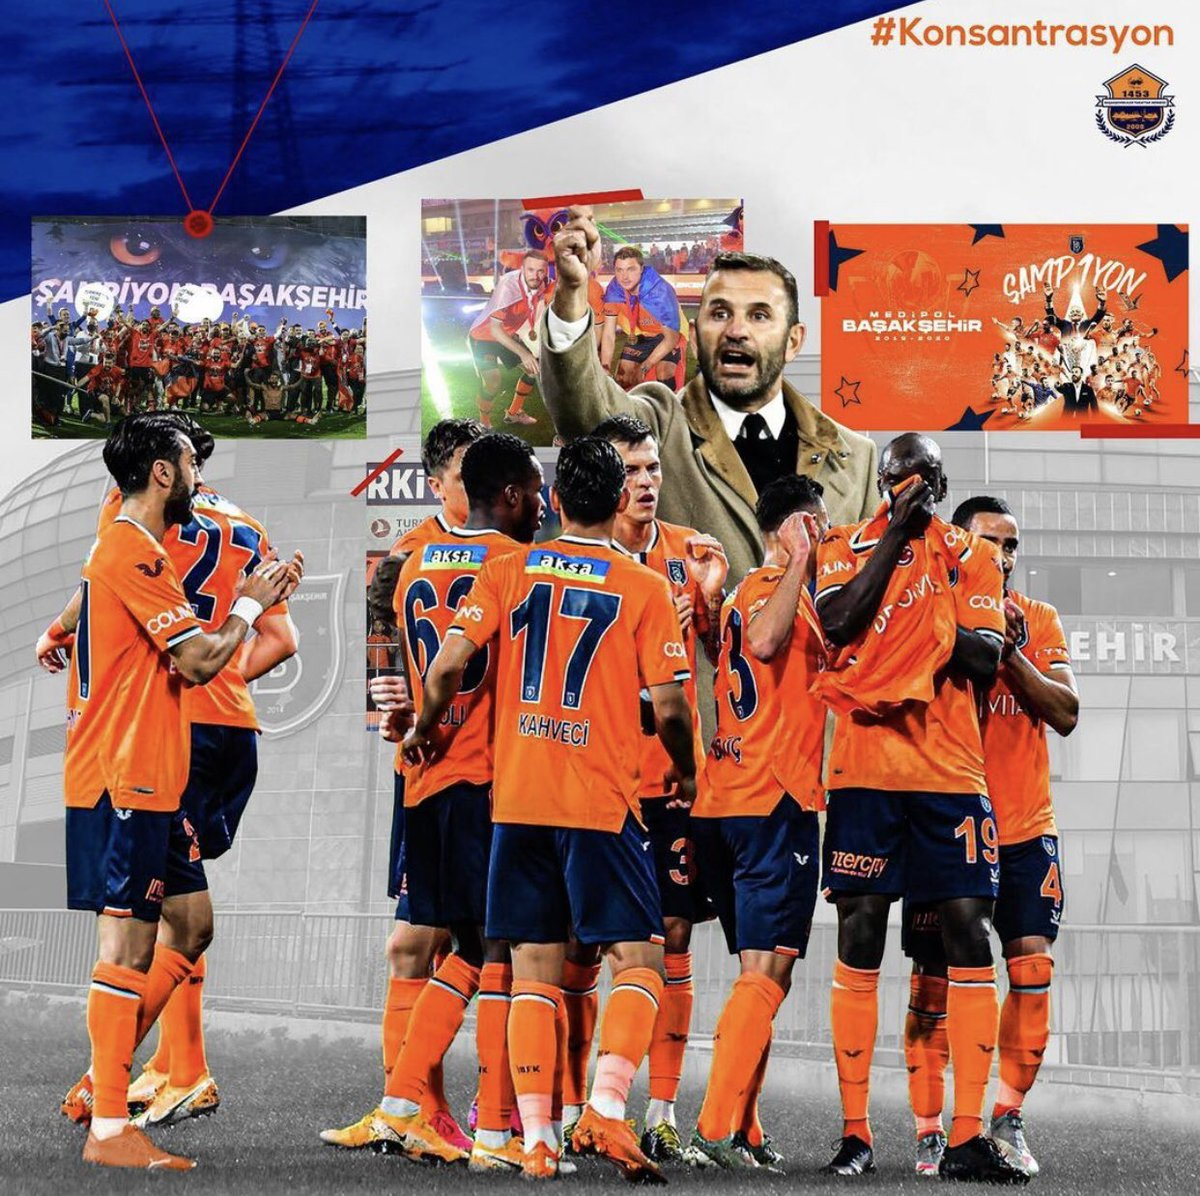 📌İstanbul Başakşehir FK Transfer  ❇️Gelenler; 👉Ömer Ali Şahiner 👉Jonior Fernandes  👉Leo Duarte  ⛔️Gidenler; 👈Kerim Frei 👈Skrtel (Sezonu Kapattı)  #sosyallig #pososyallig https://t.co/m6q68Frrtg